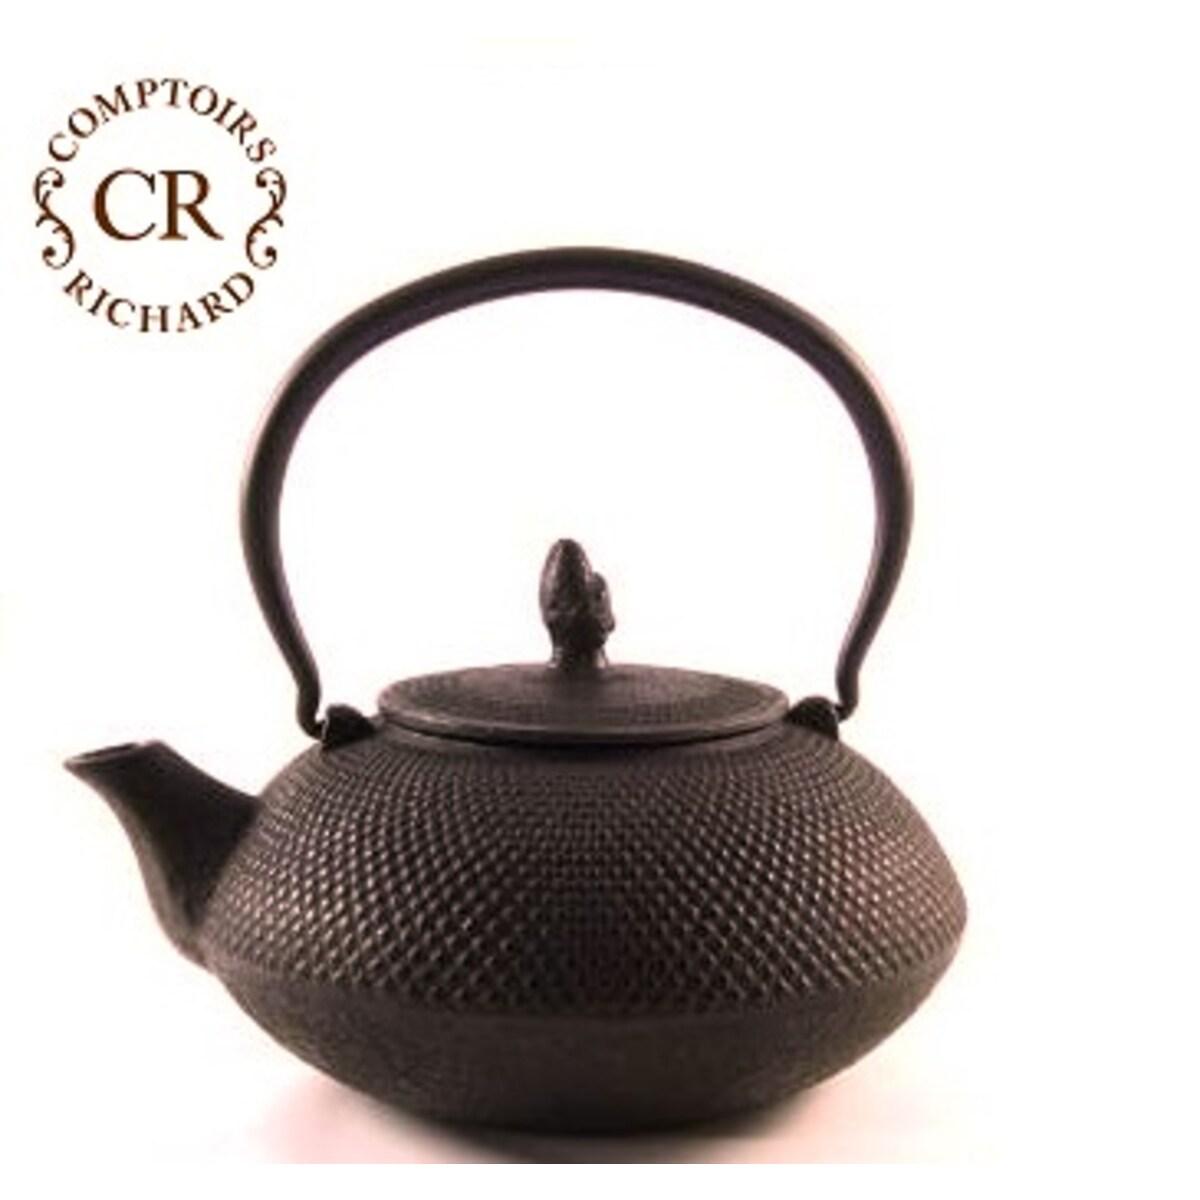 Comptoirs Richard чугунен чайник - кафяв